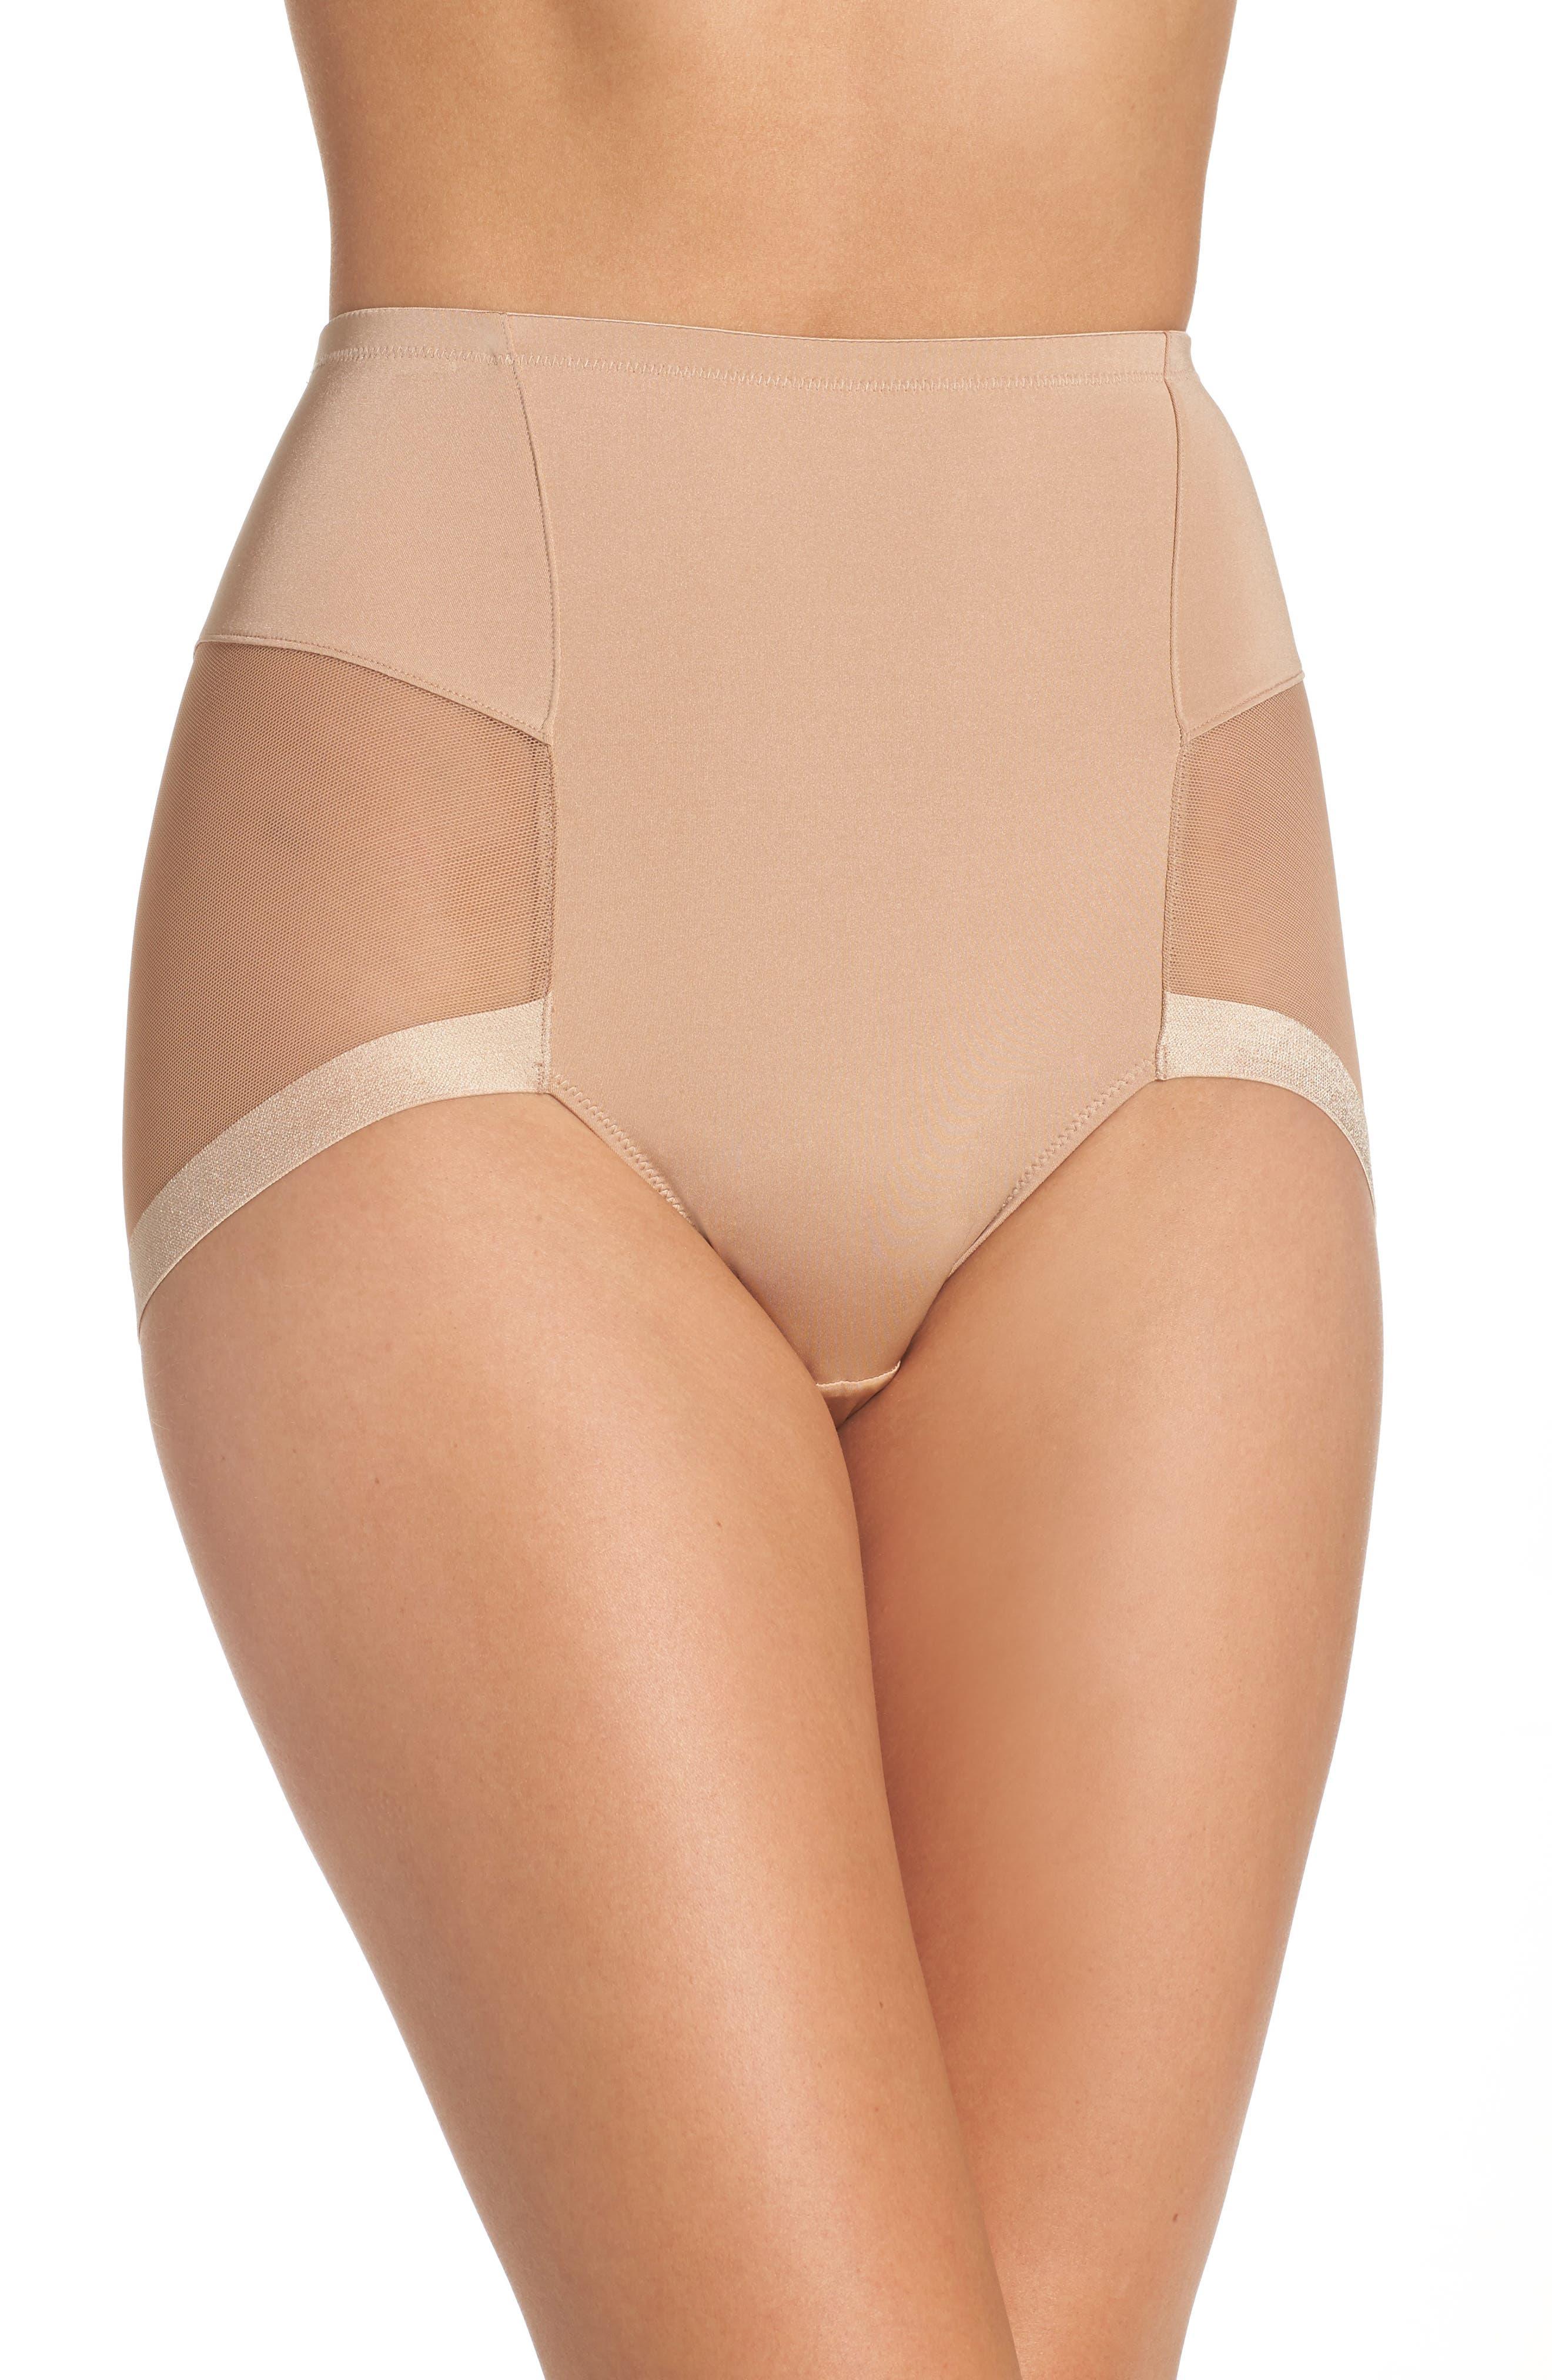 Alternate Image 1 Selected - Le Mystère Infinite High Waist Shaper Panties